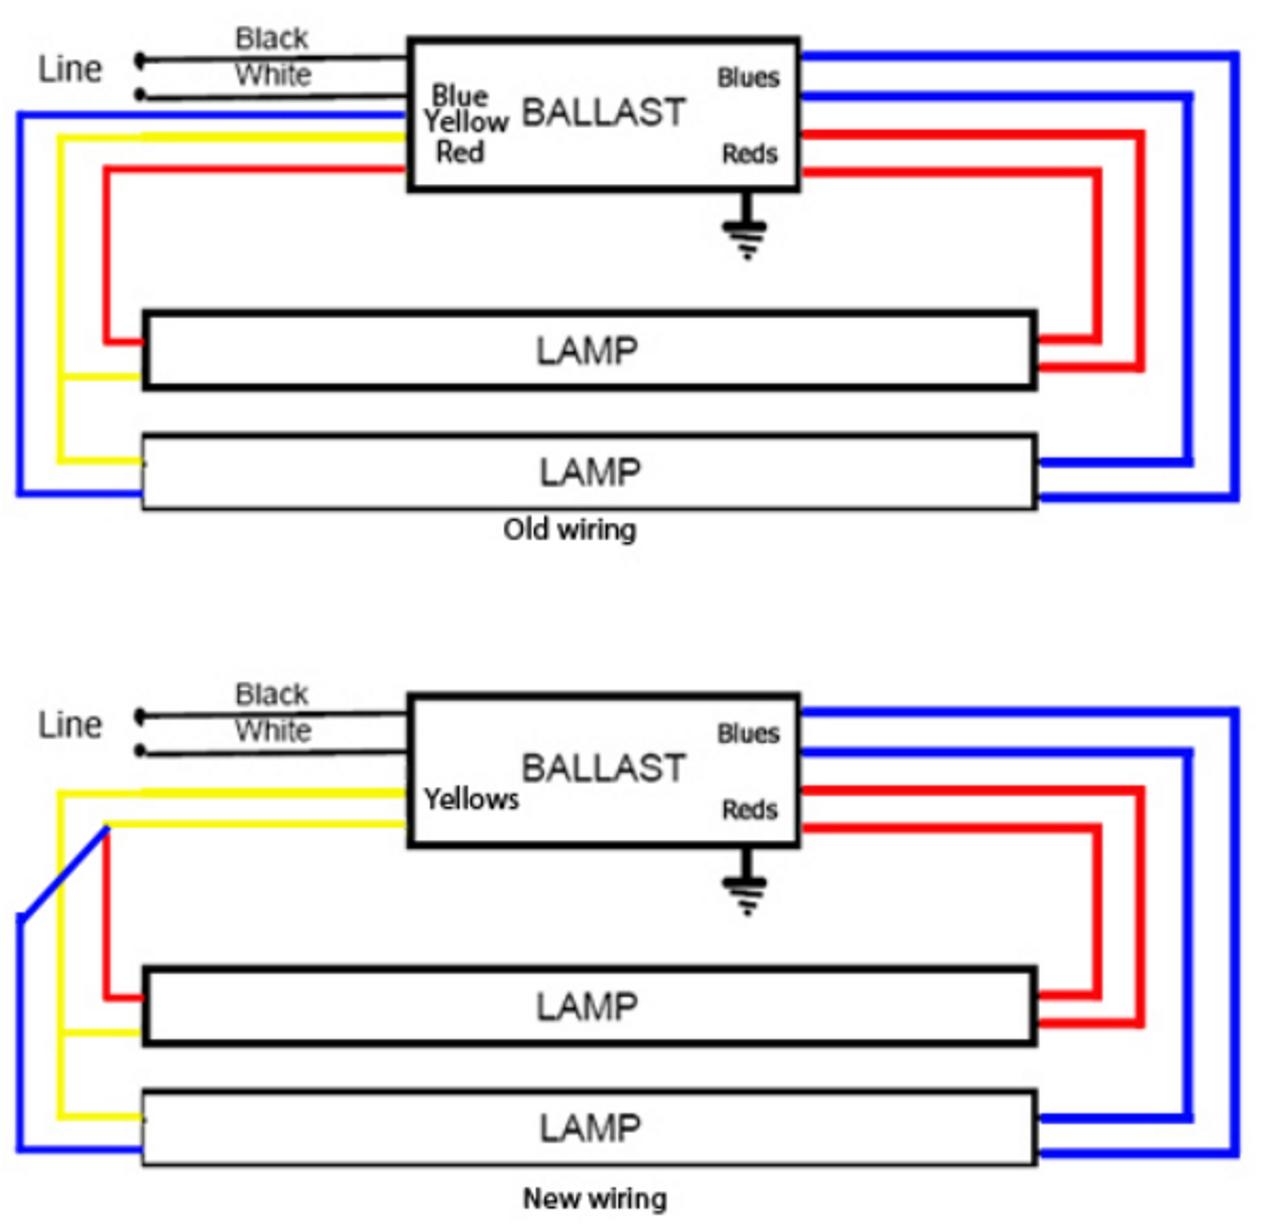 Sunpark Sl15t Electronic Replacement Ballastrhballastshop: Circline Wiring Diagram At Gmaili.net